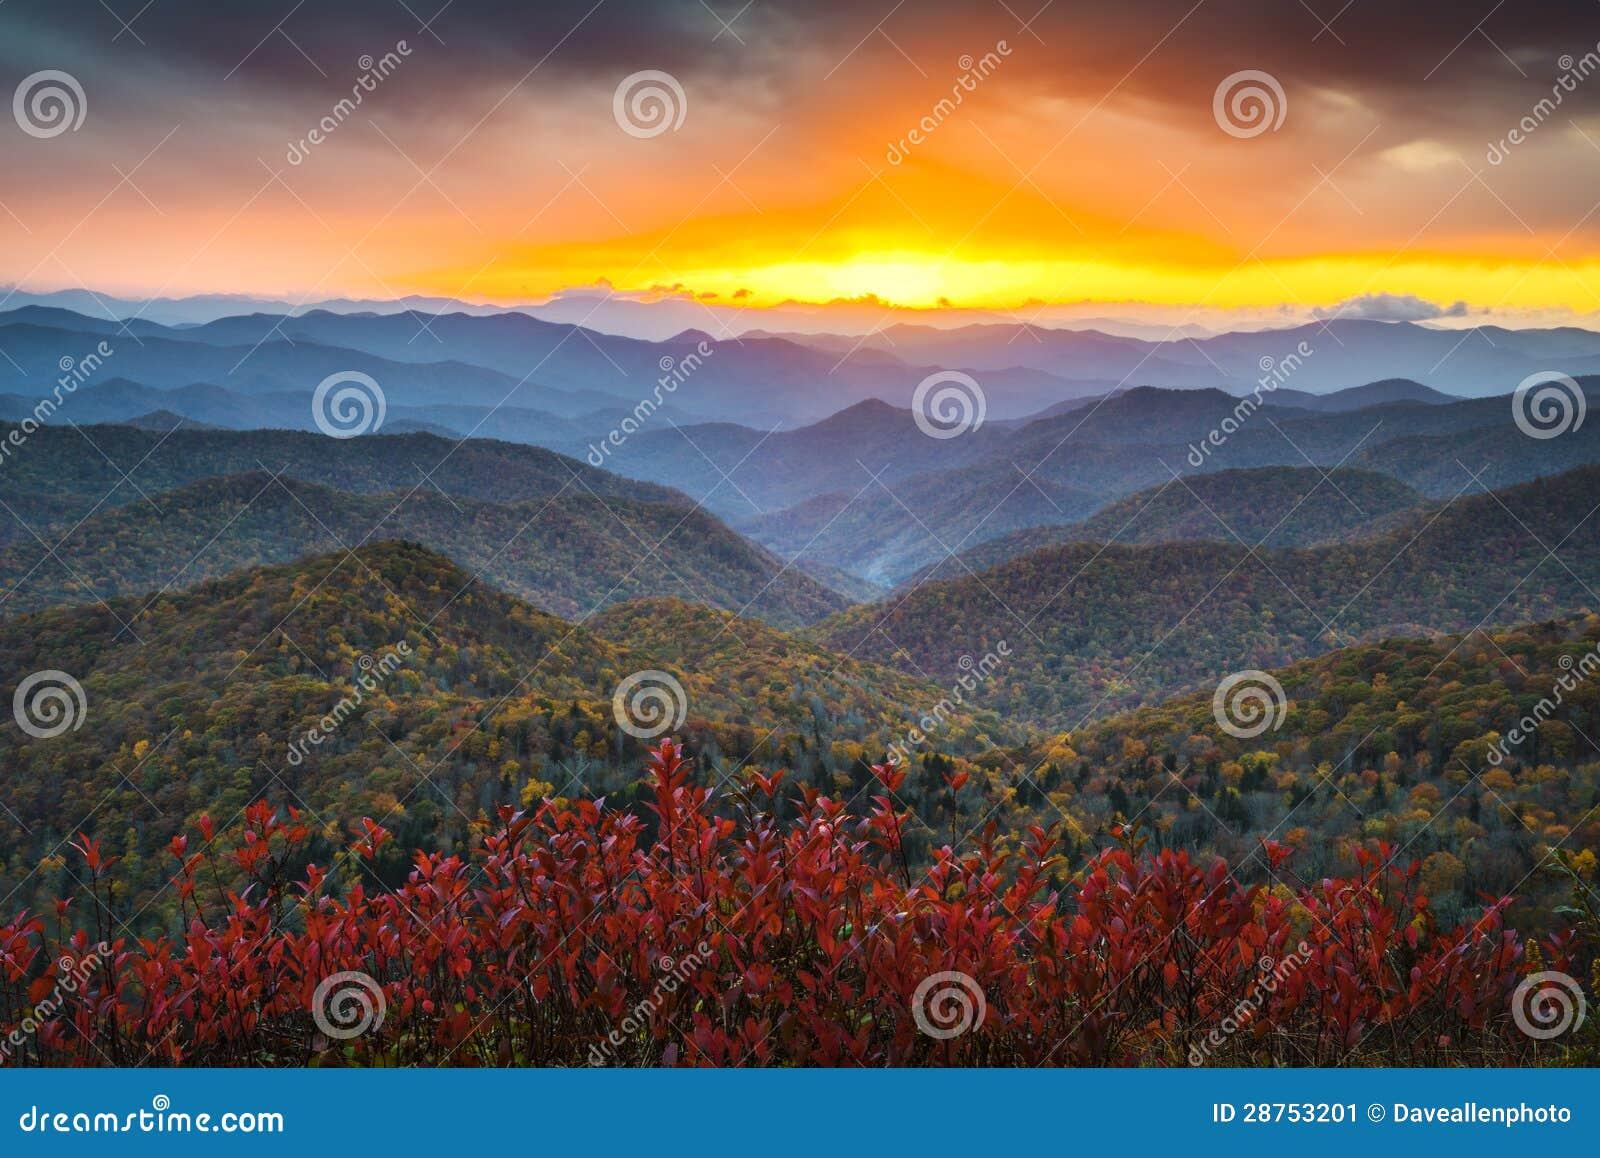 Blue Ridge Parkway Autumn Appalachian Mountains Sunset Western NC